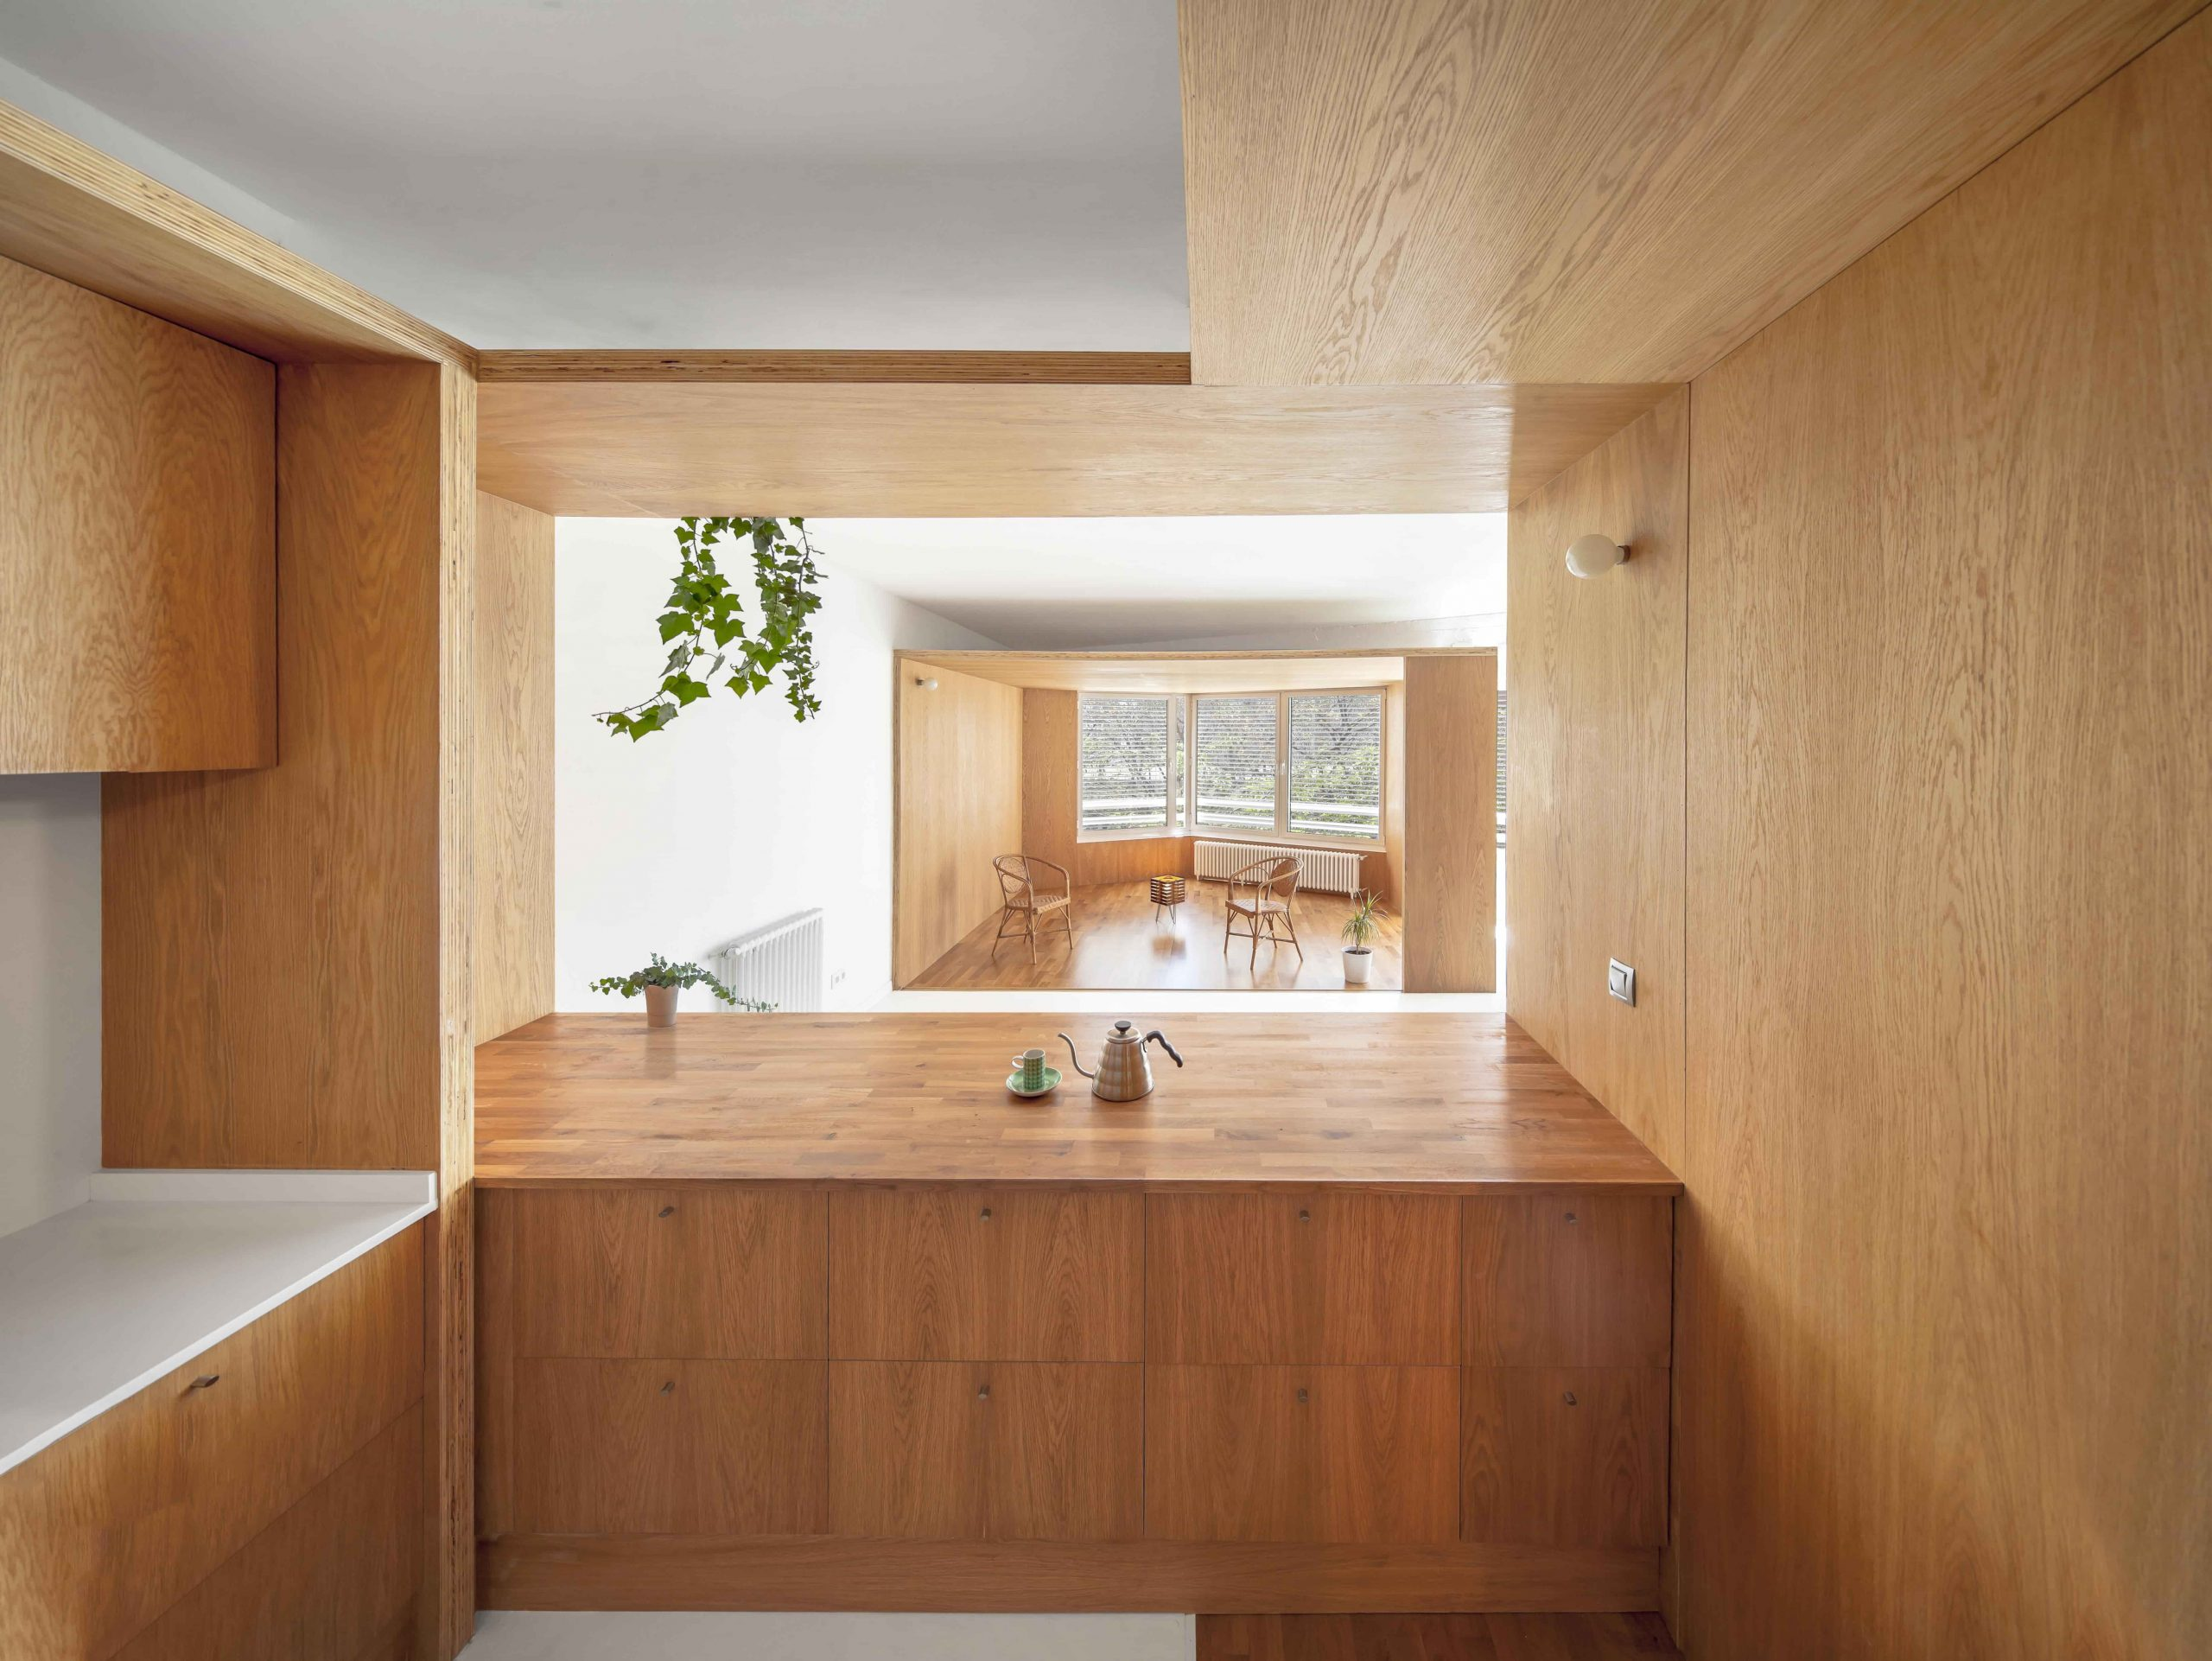 Acceso a la zona común de la rehabilitación arquitectónica del apartamento extenso-intenso en Barcelona